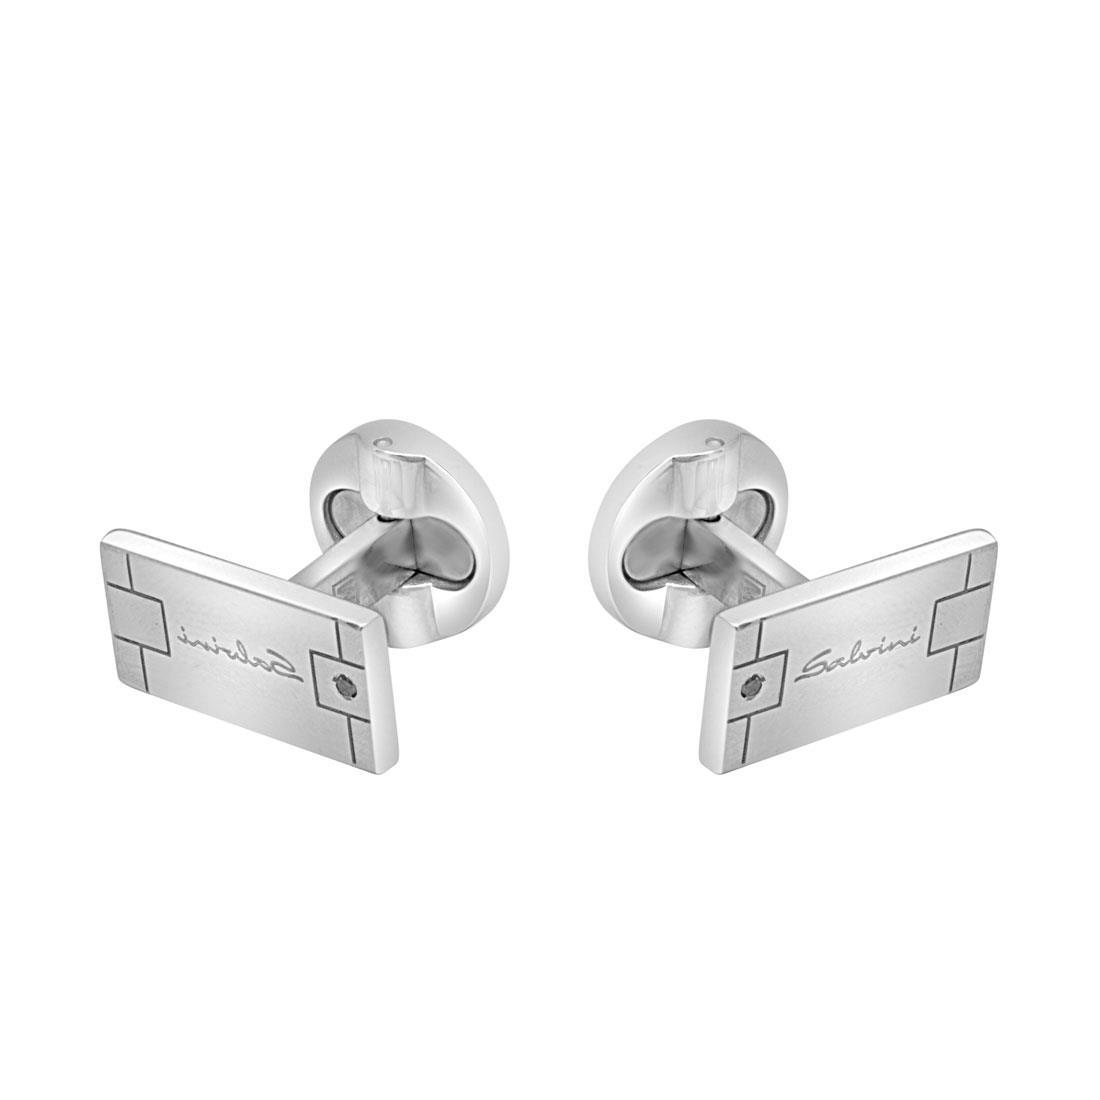 Gemelli in argento con diamante ct 0.02, misura 9mmx1,5 cm - SALVINI